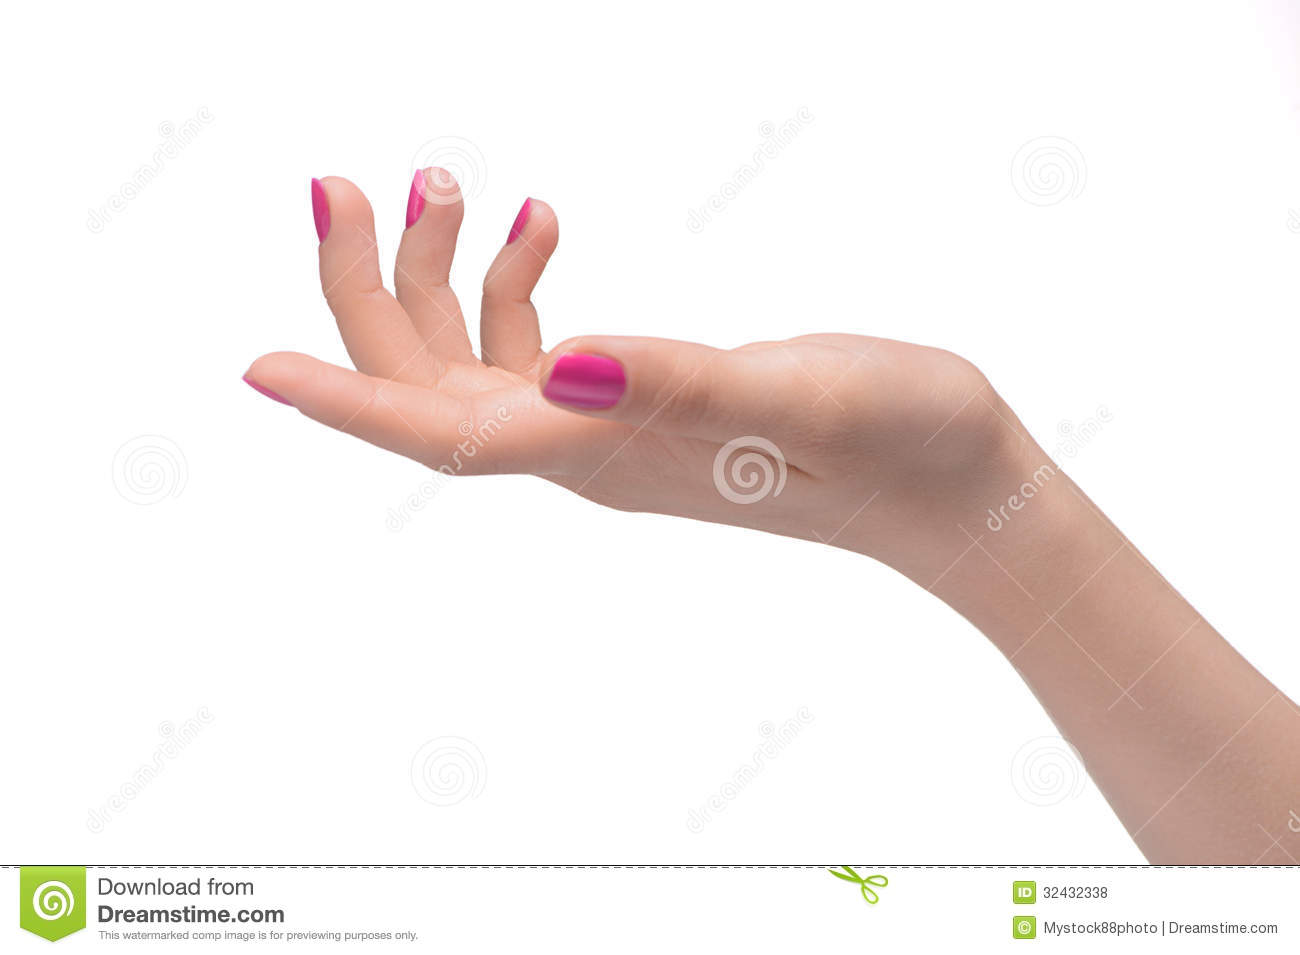 Hand Gesture #9